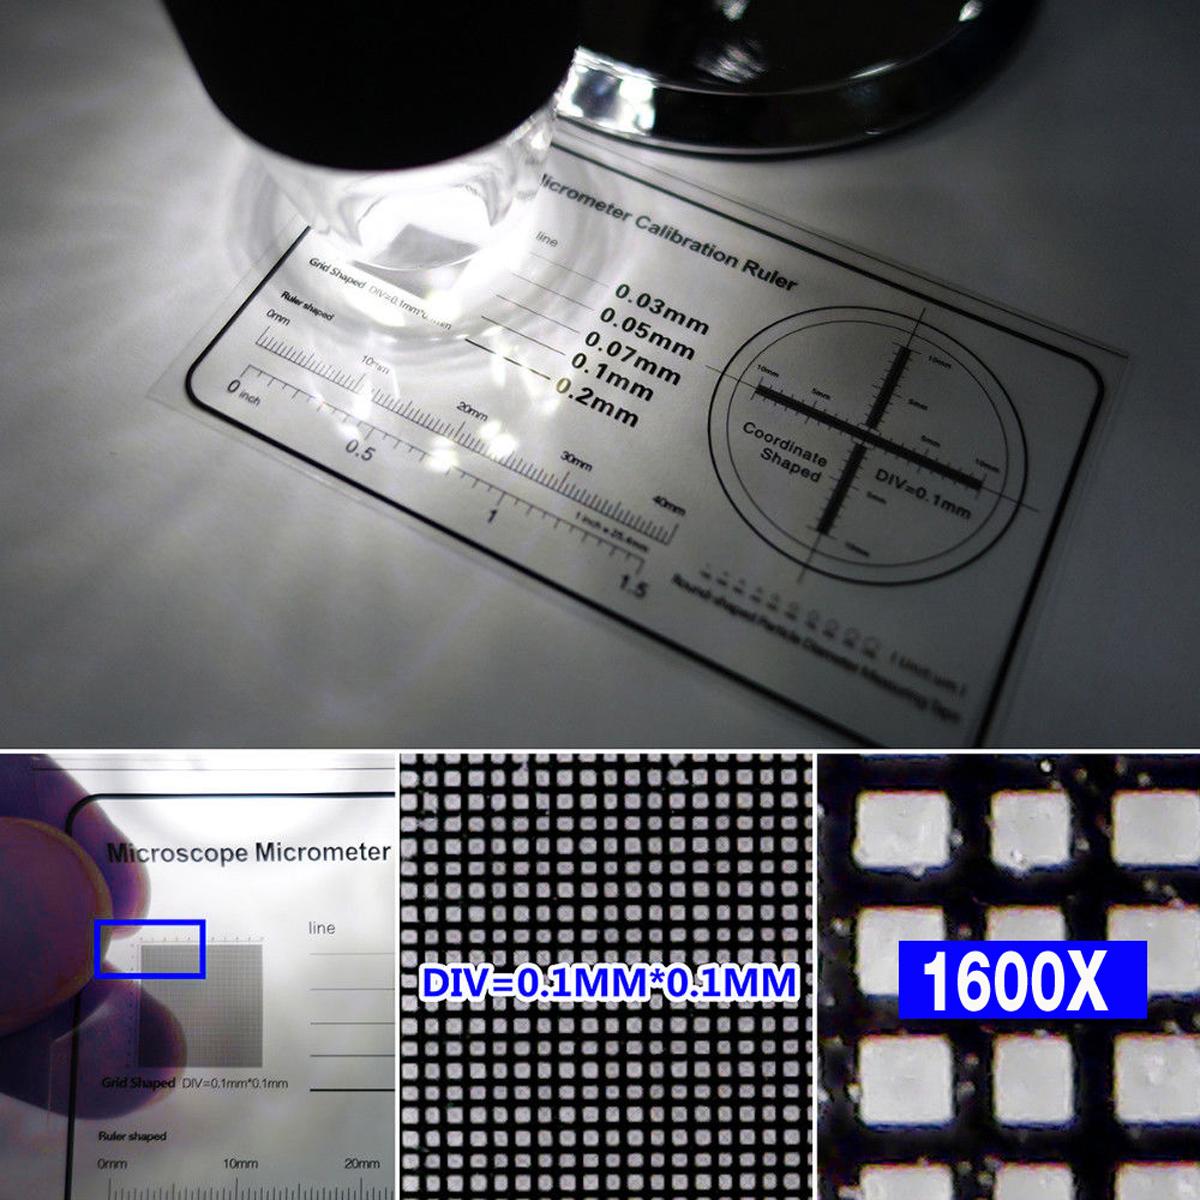 5b888df6 b68a 45ac 9cb4 dfceafcb3fb5 1600X 8 LED Zoom USB Digital Microscope+Video Stand